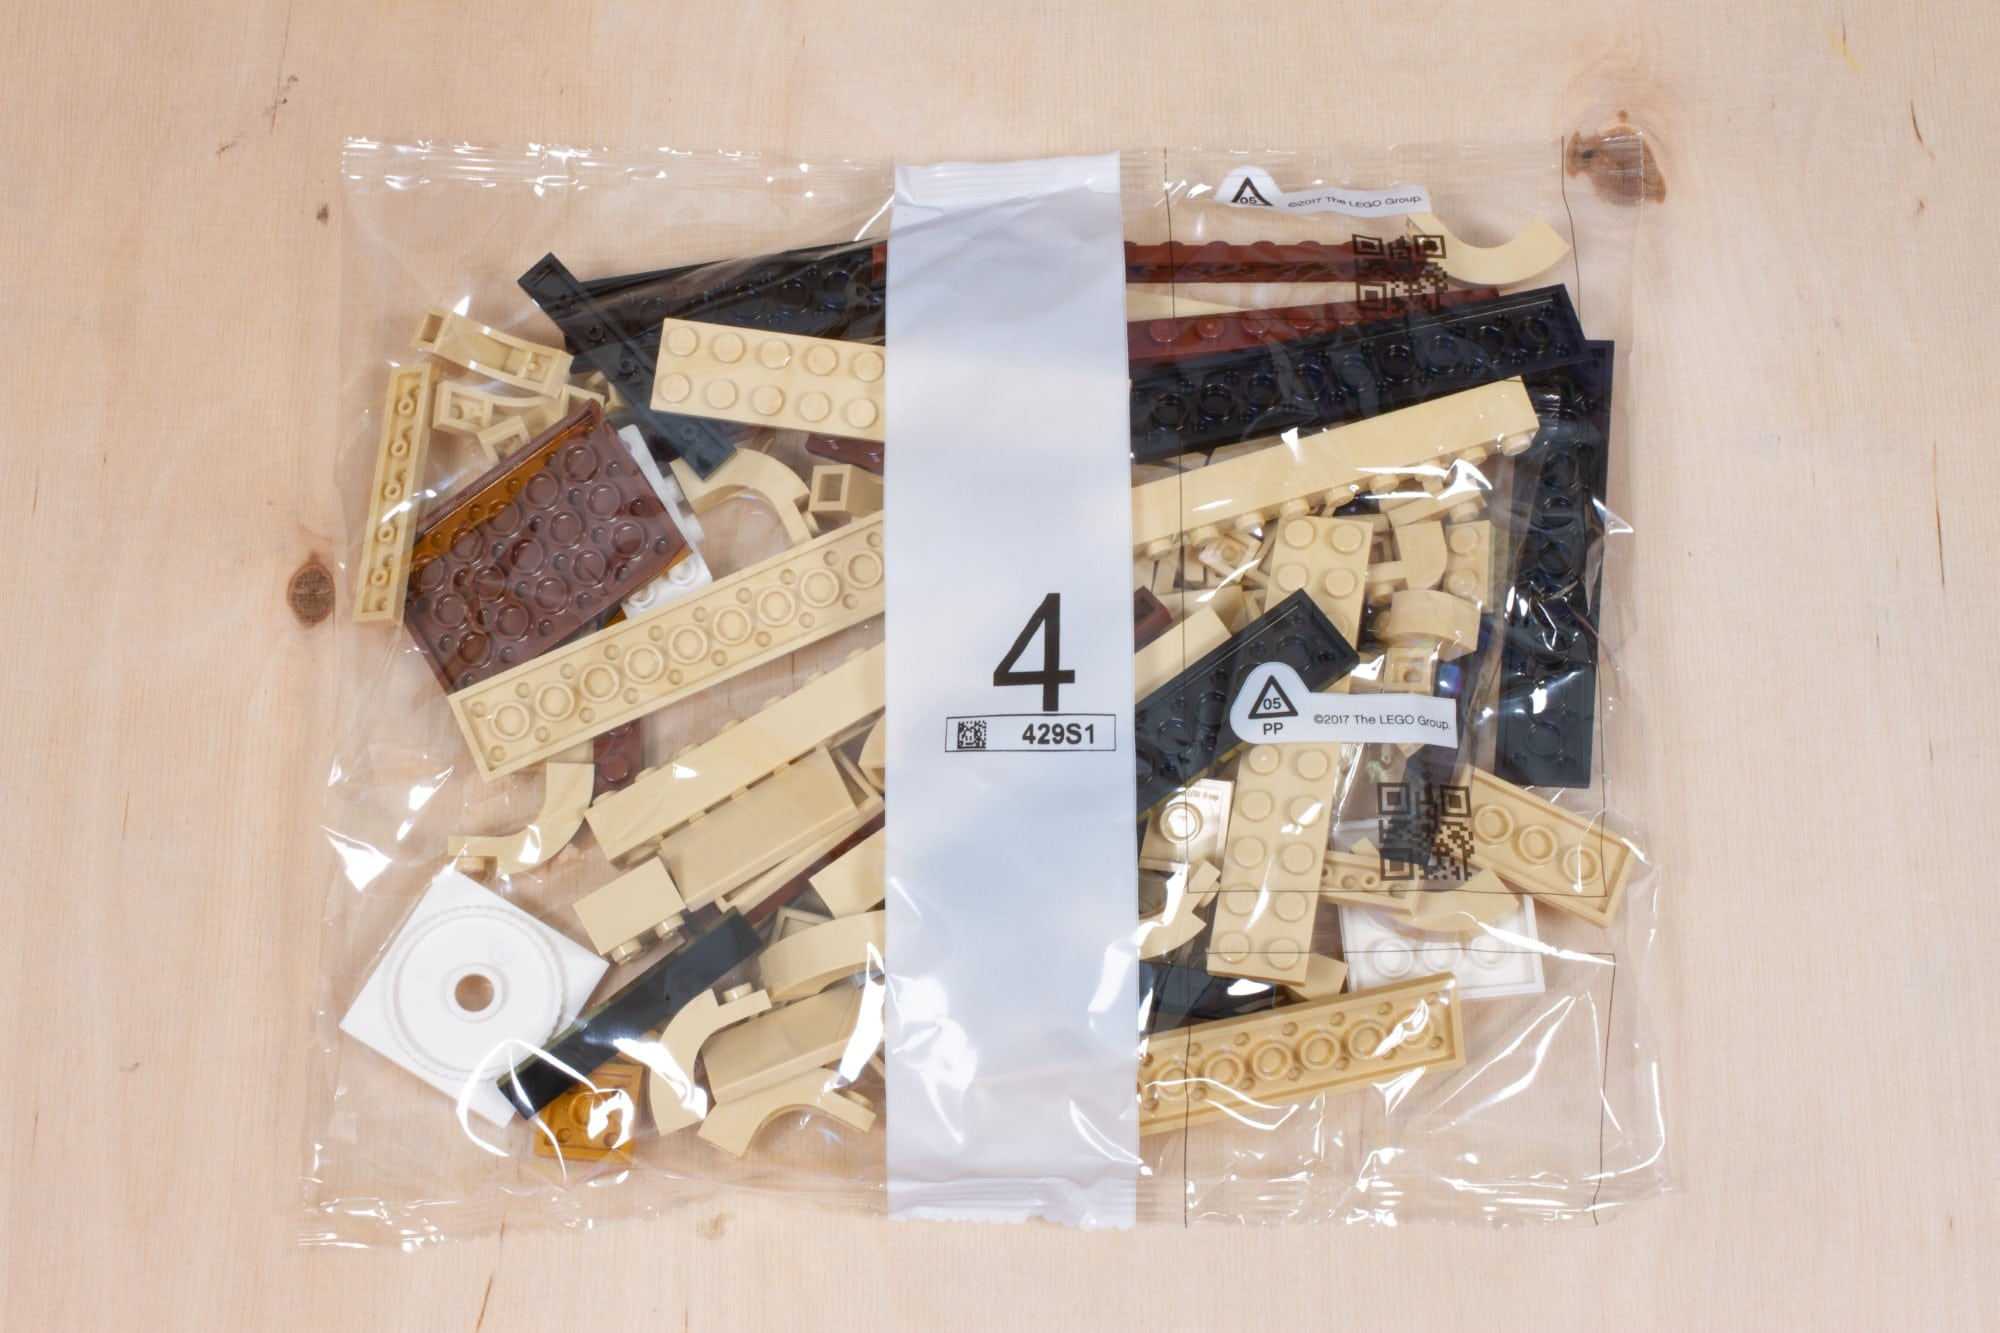 LEGO 76391 Hogwarts Icons Review Unboxing 2 Schritt 4